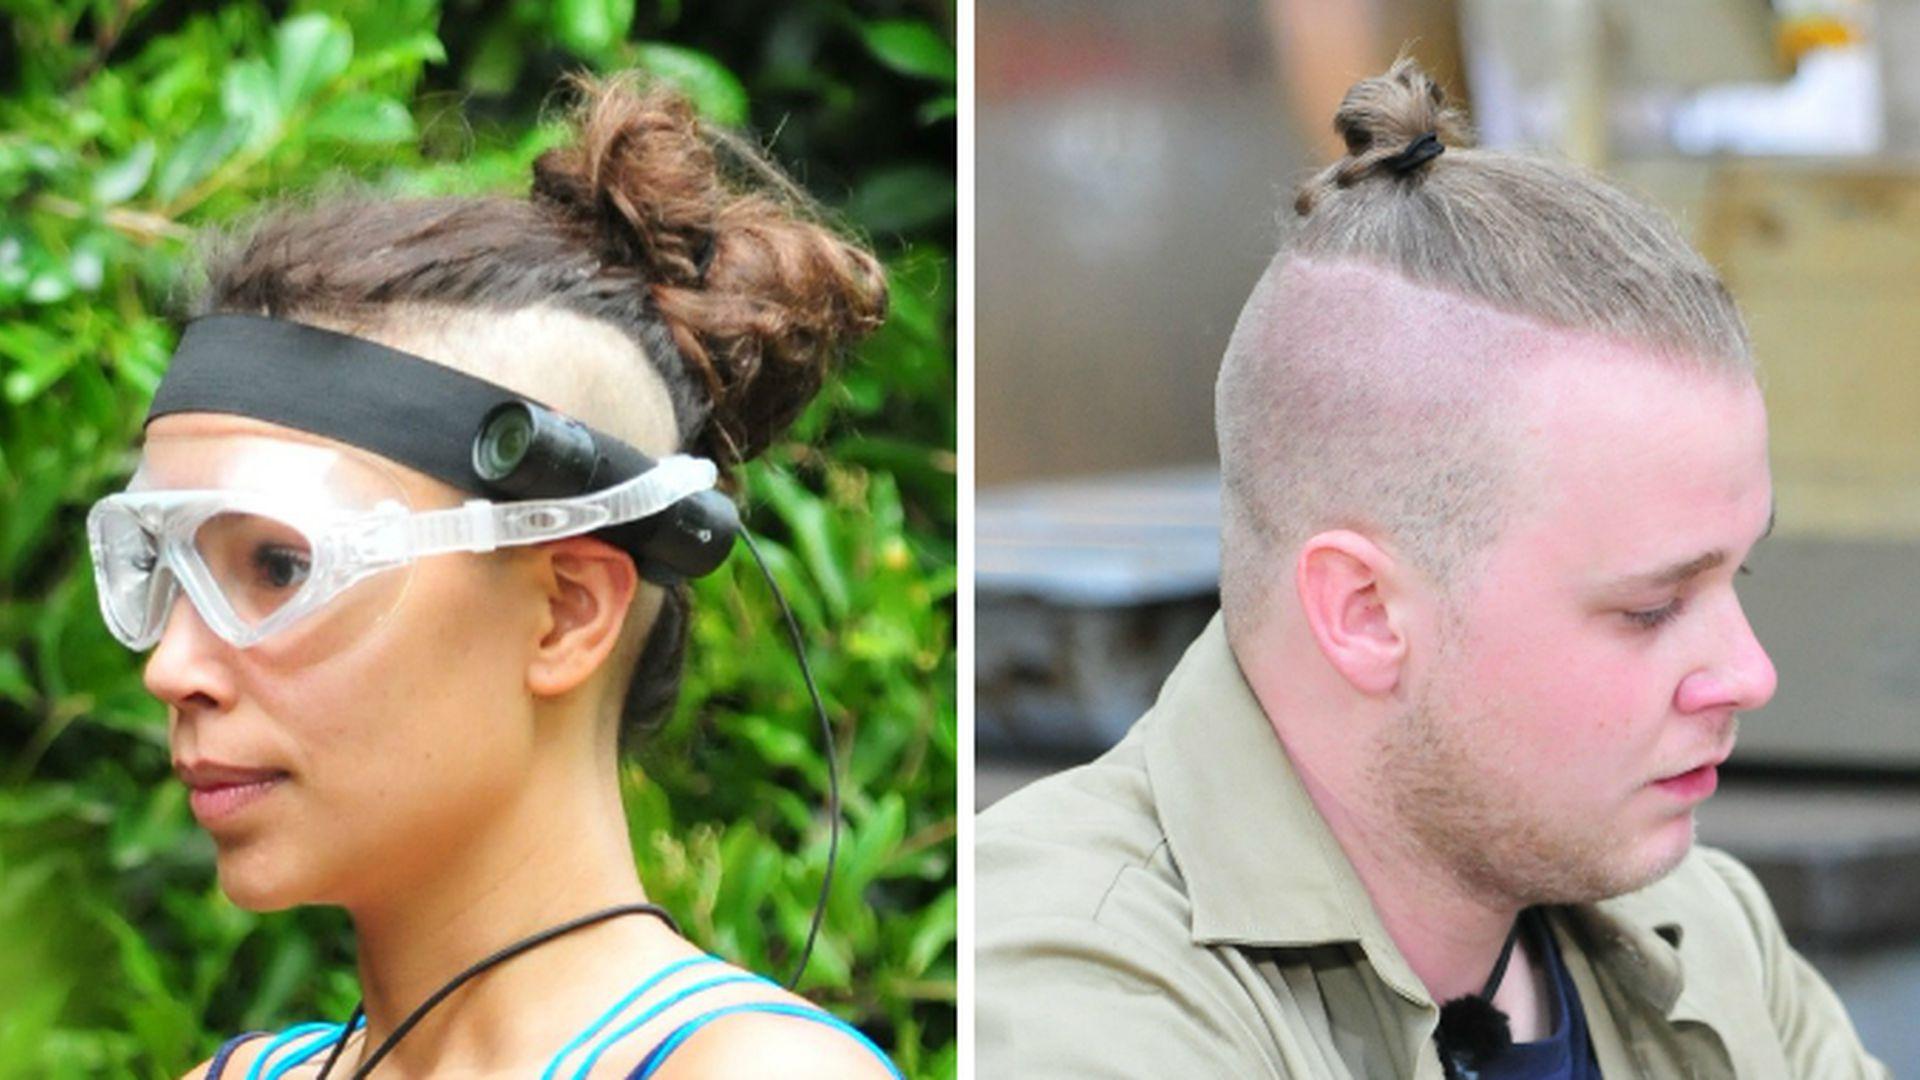 Neuer Dschungel Trend Gisele Trägt Plötzlich Felix Frisur